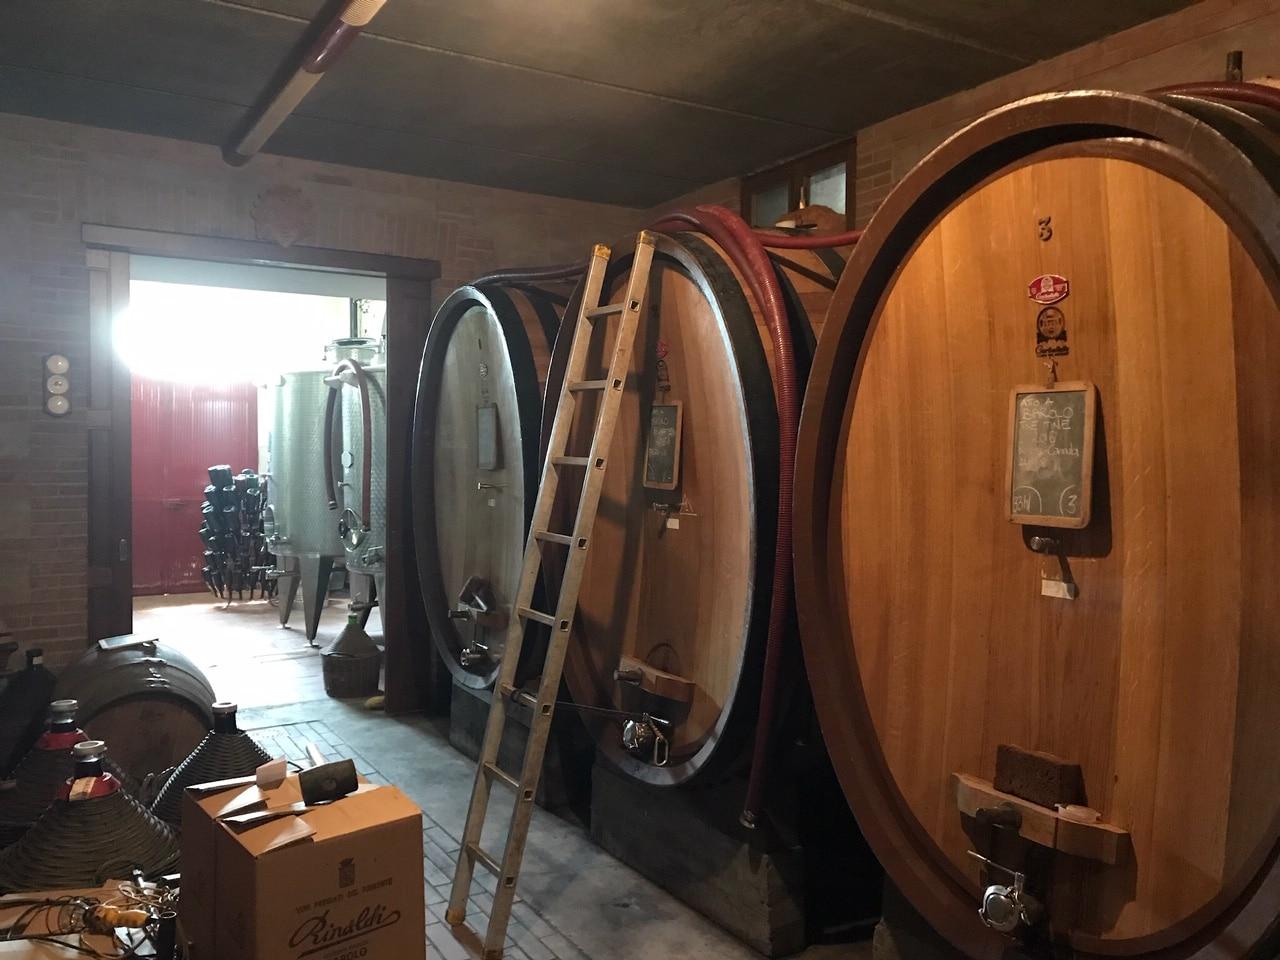 rinaldi giuseppe vin barolo italien